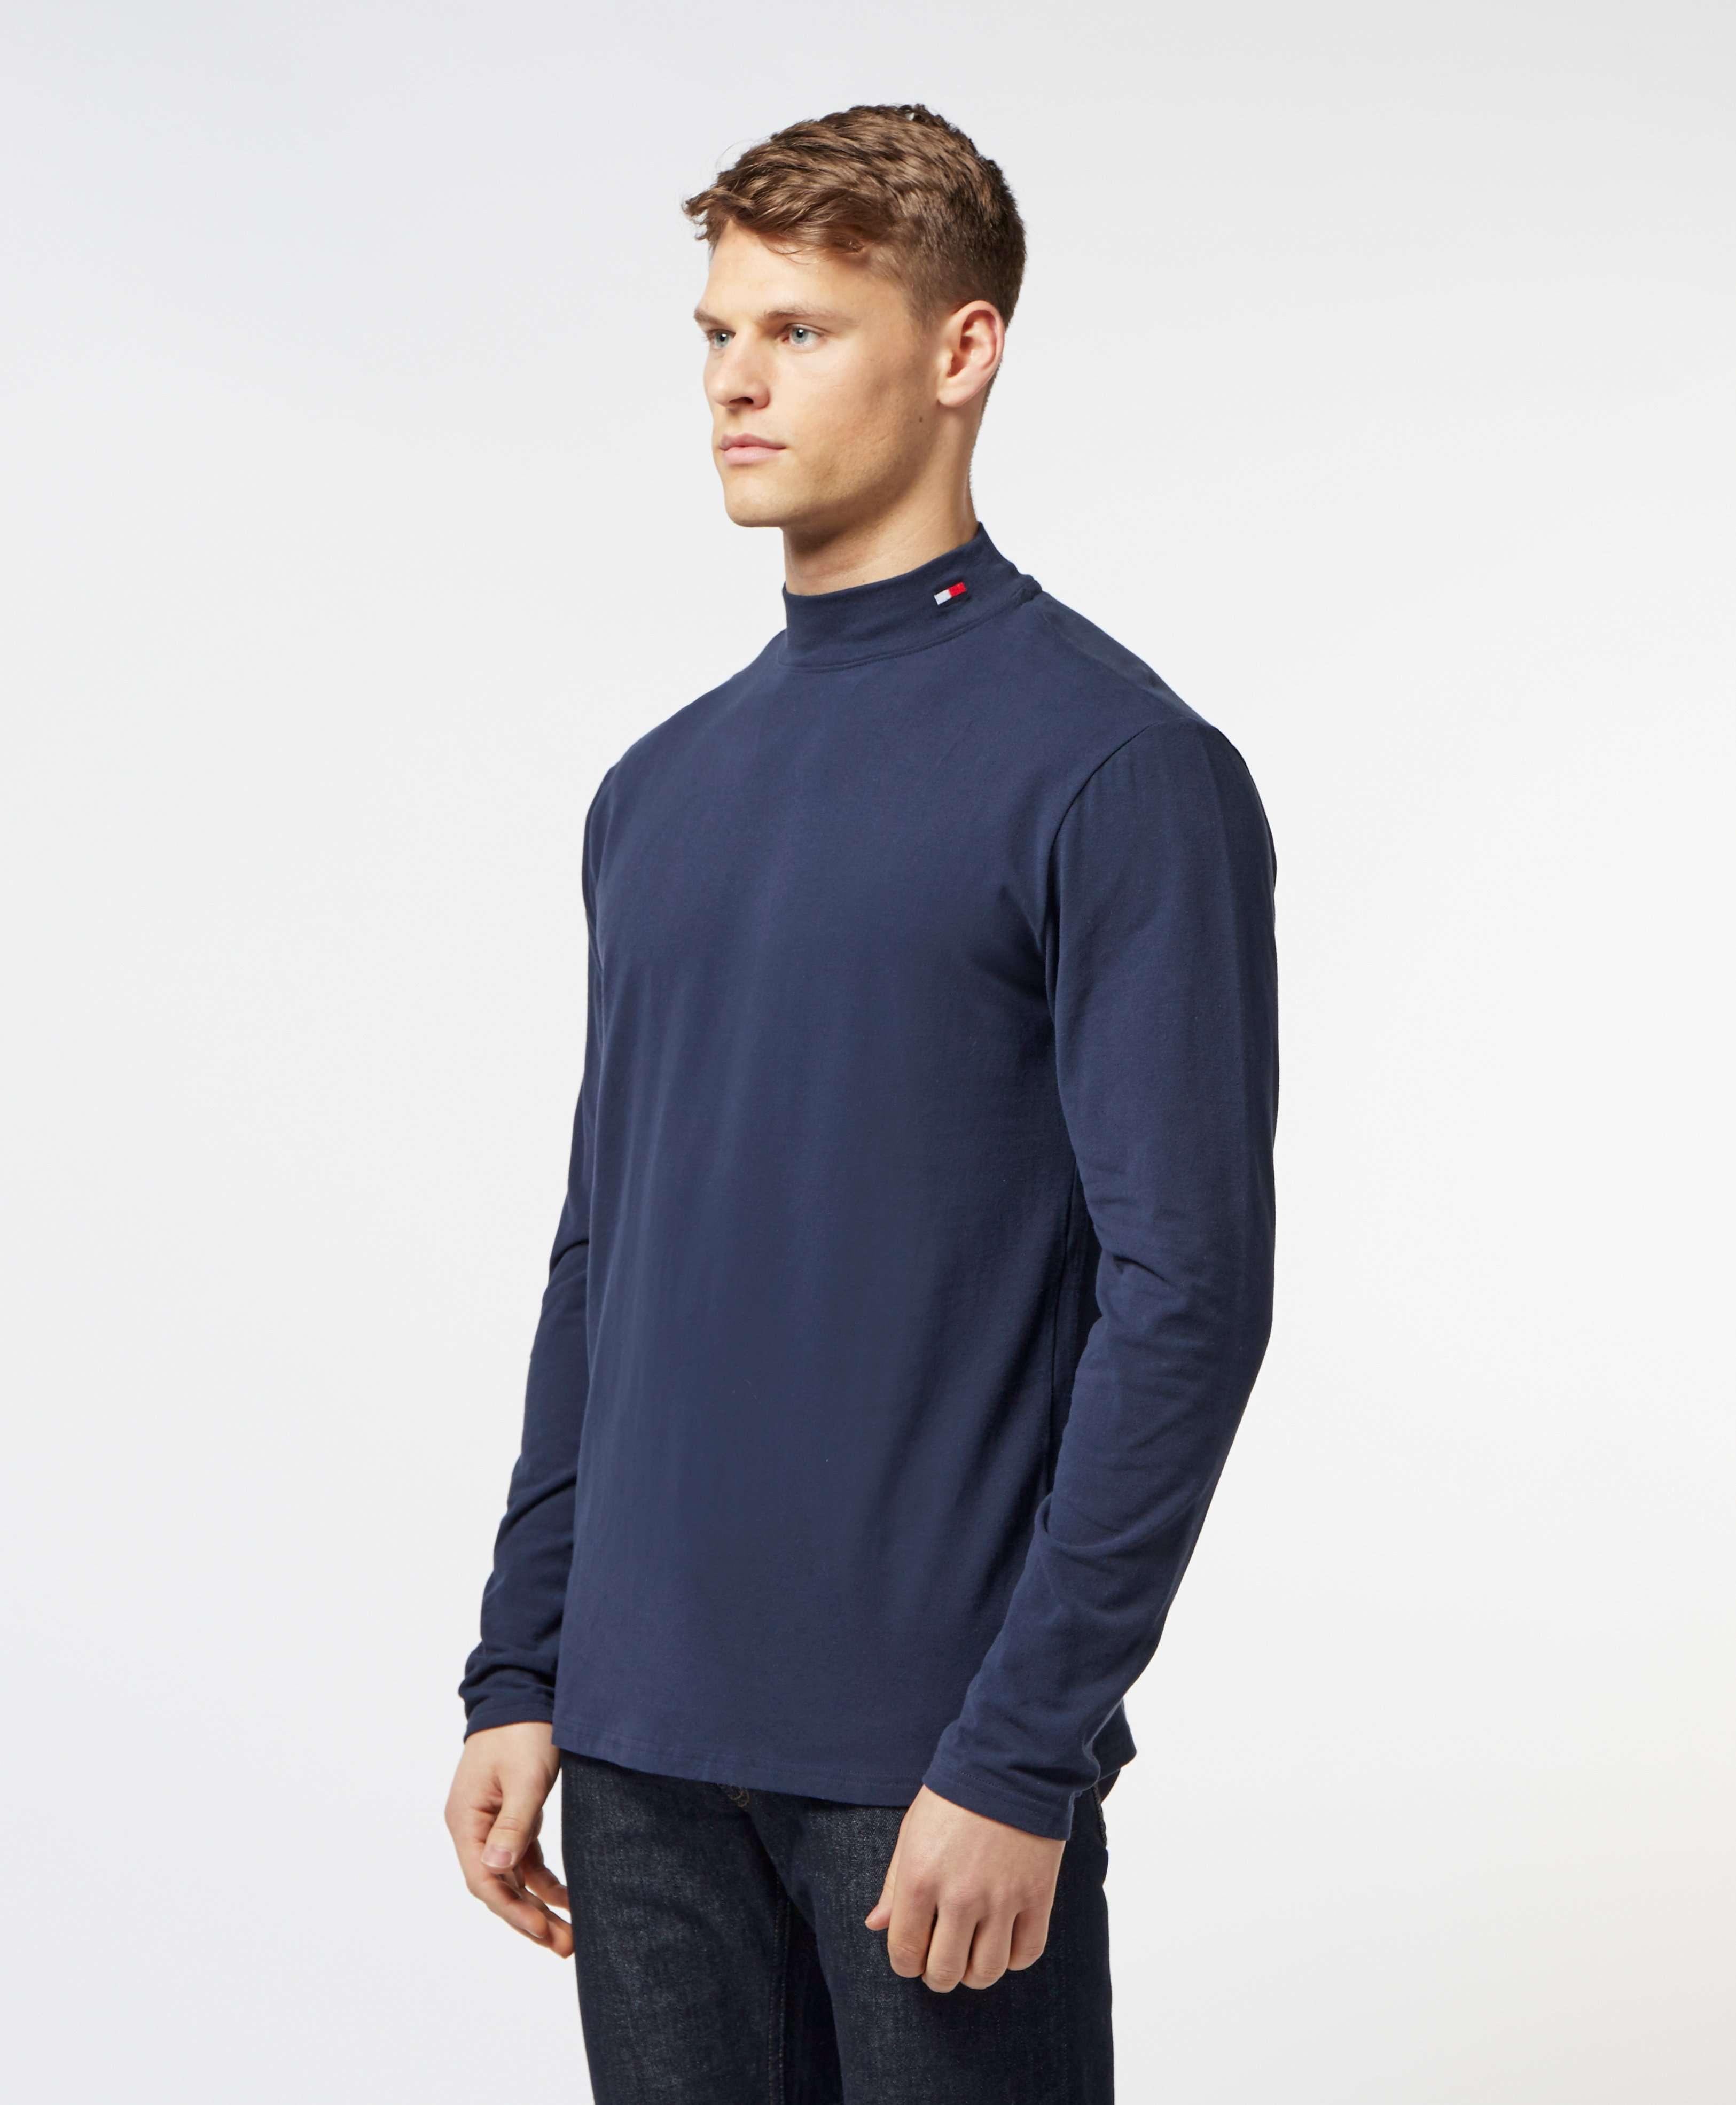 Tommy Hilfiger Mock Long Sleeve T-Shirt